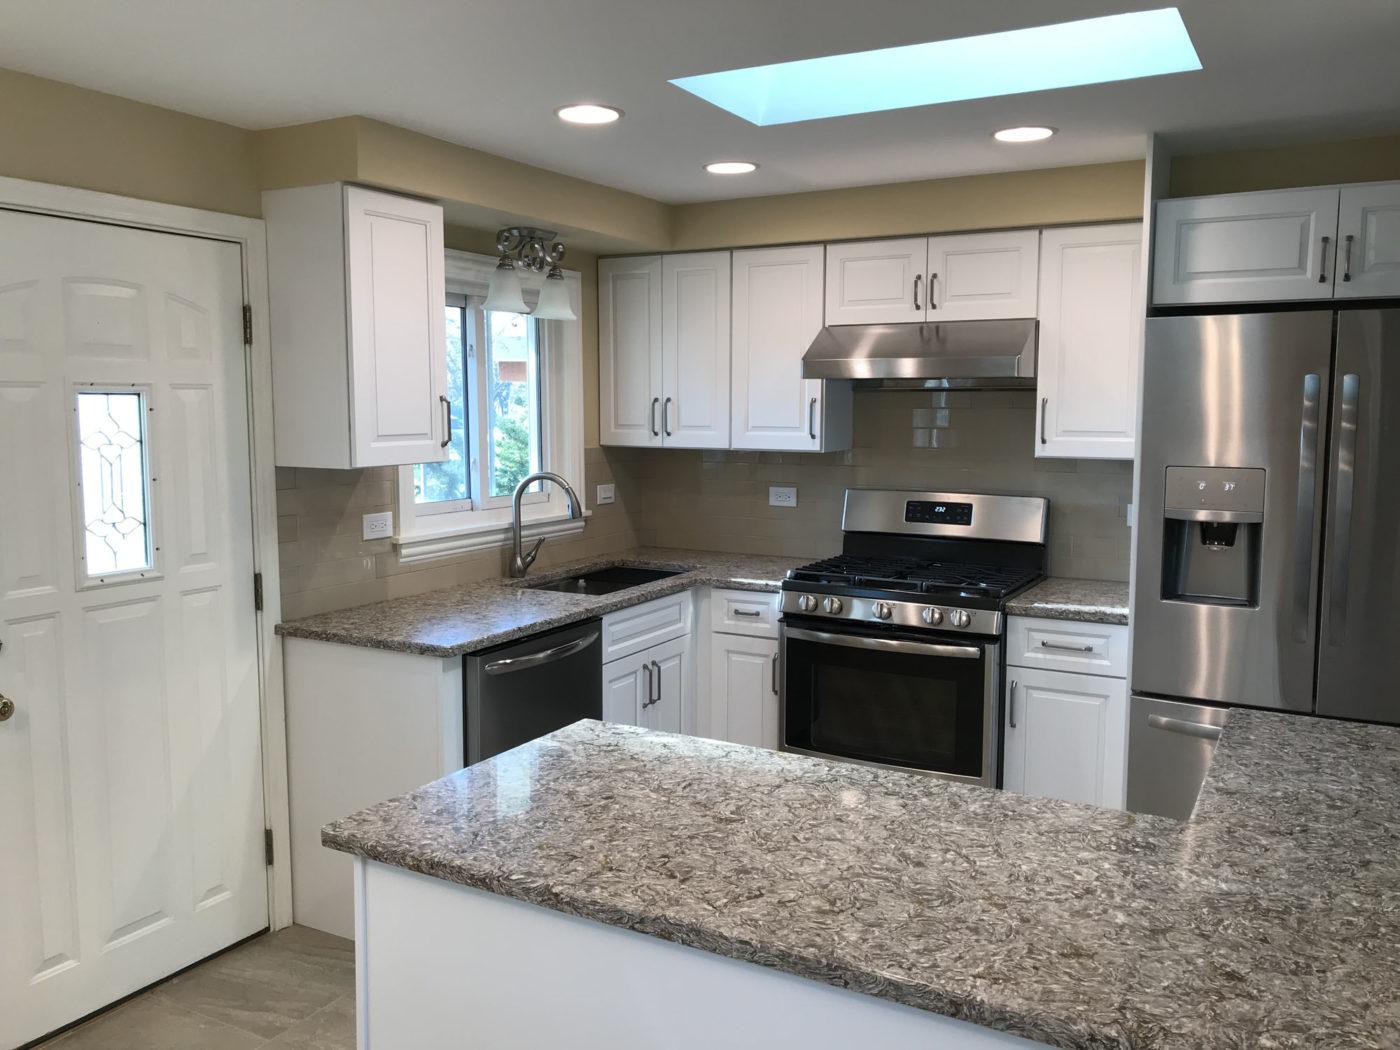 Newly remodeled kitchen Schaumburg IL